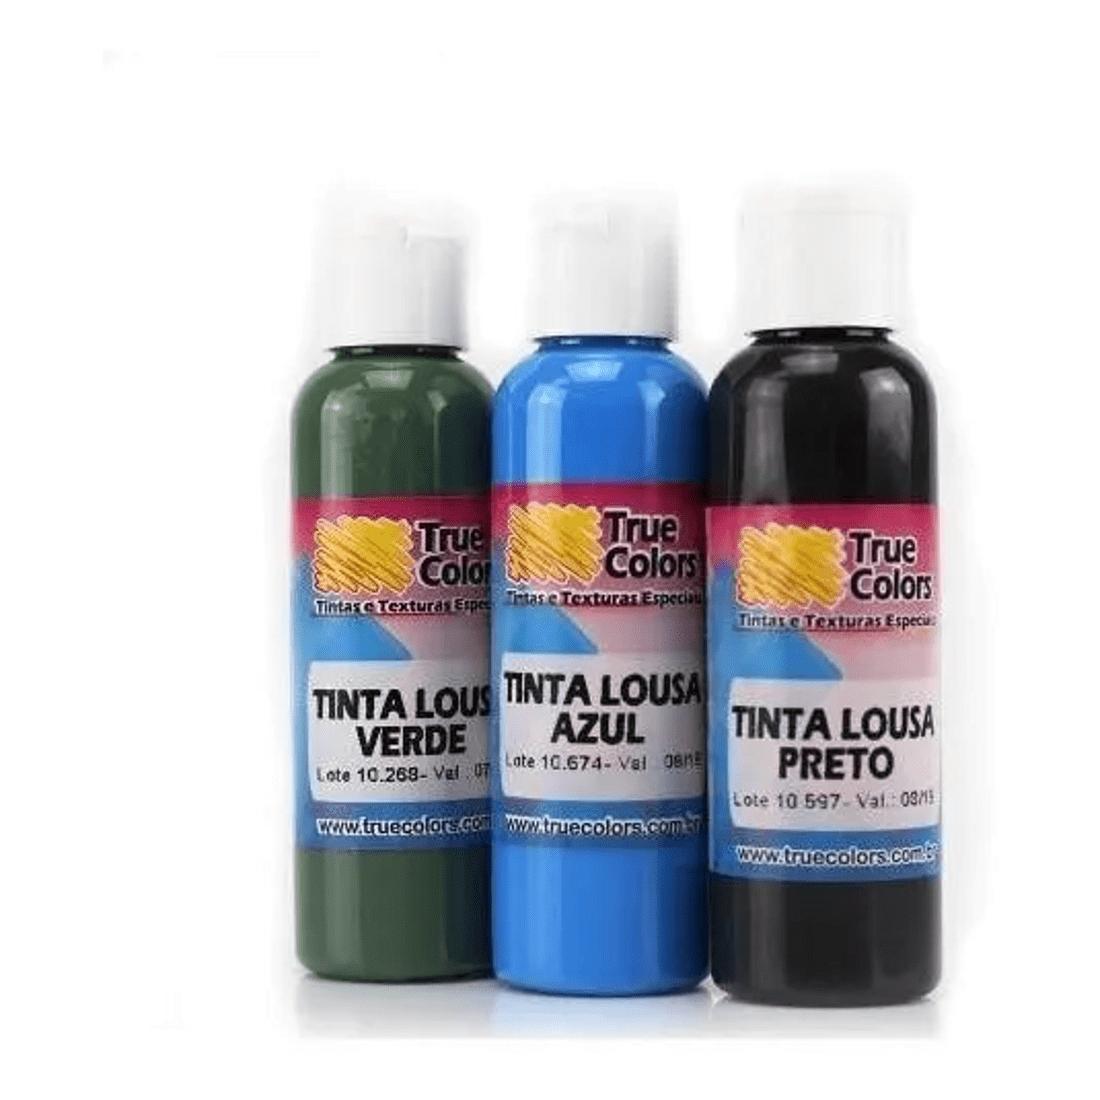 Tinta-Lousa-60ml-True-Colors-verde